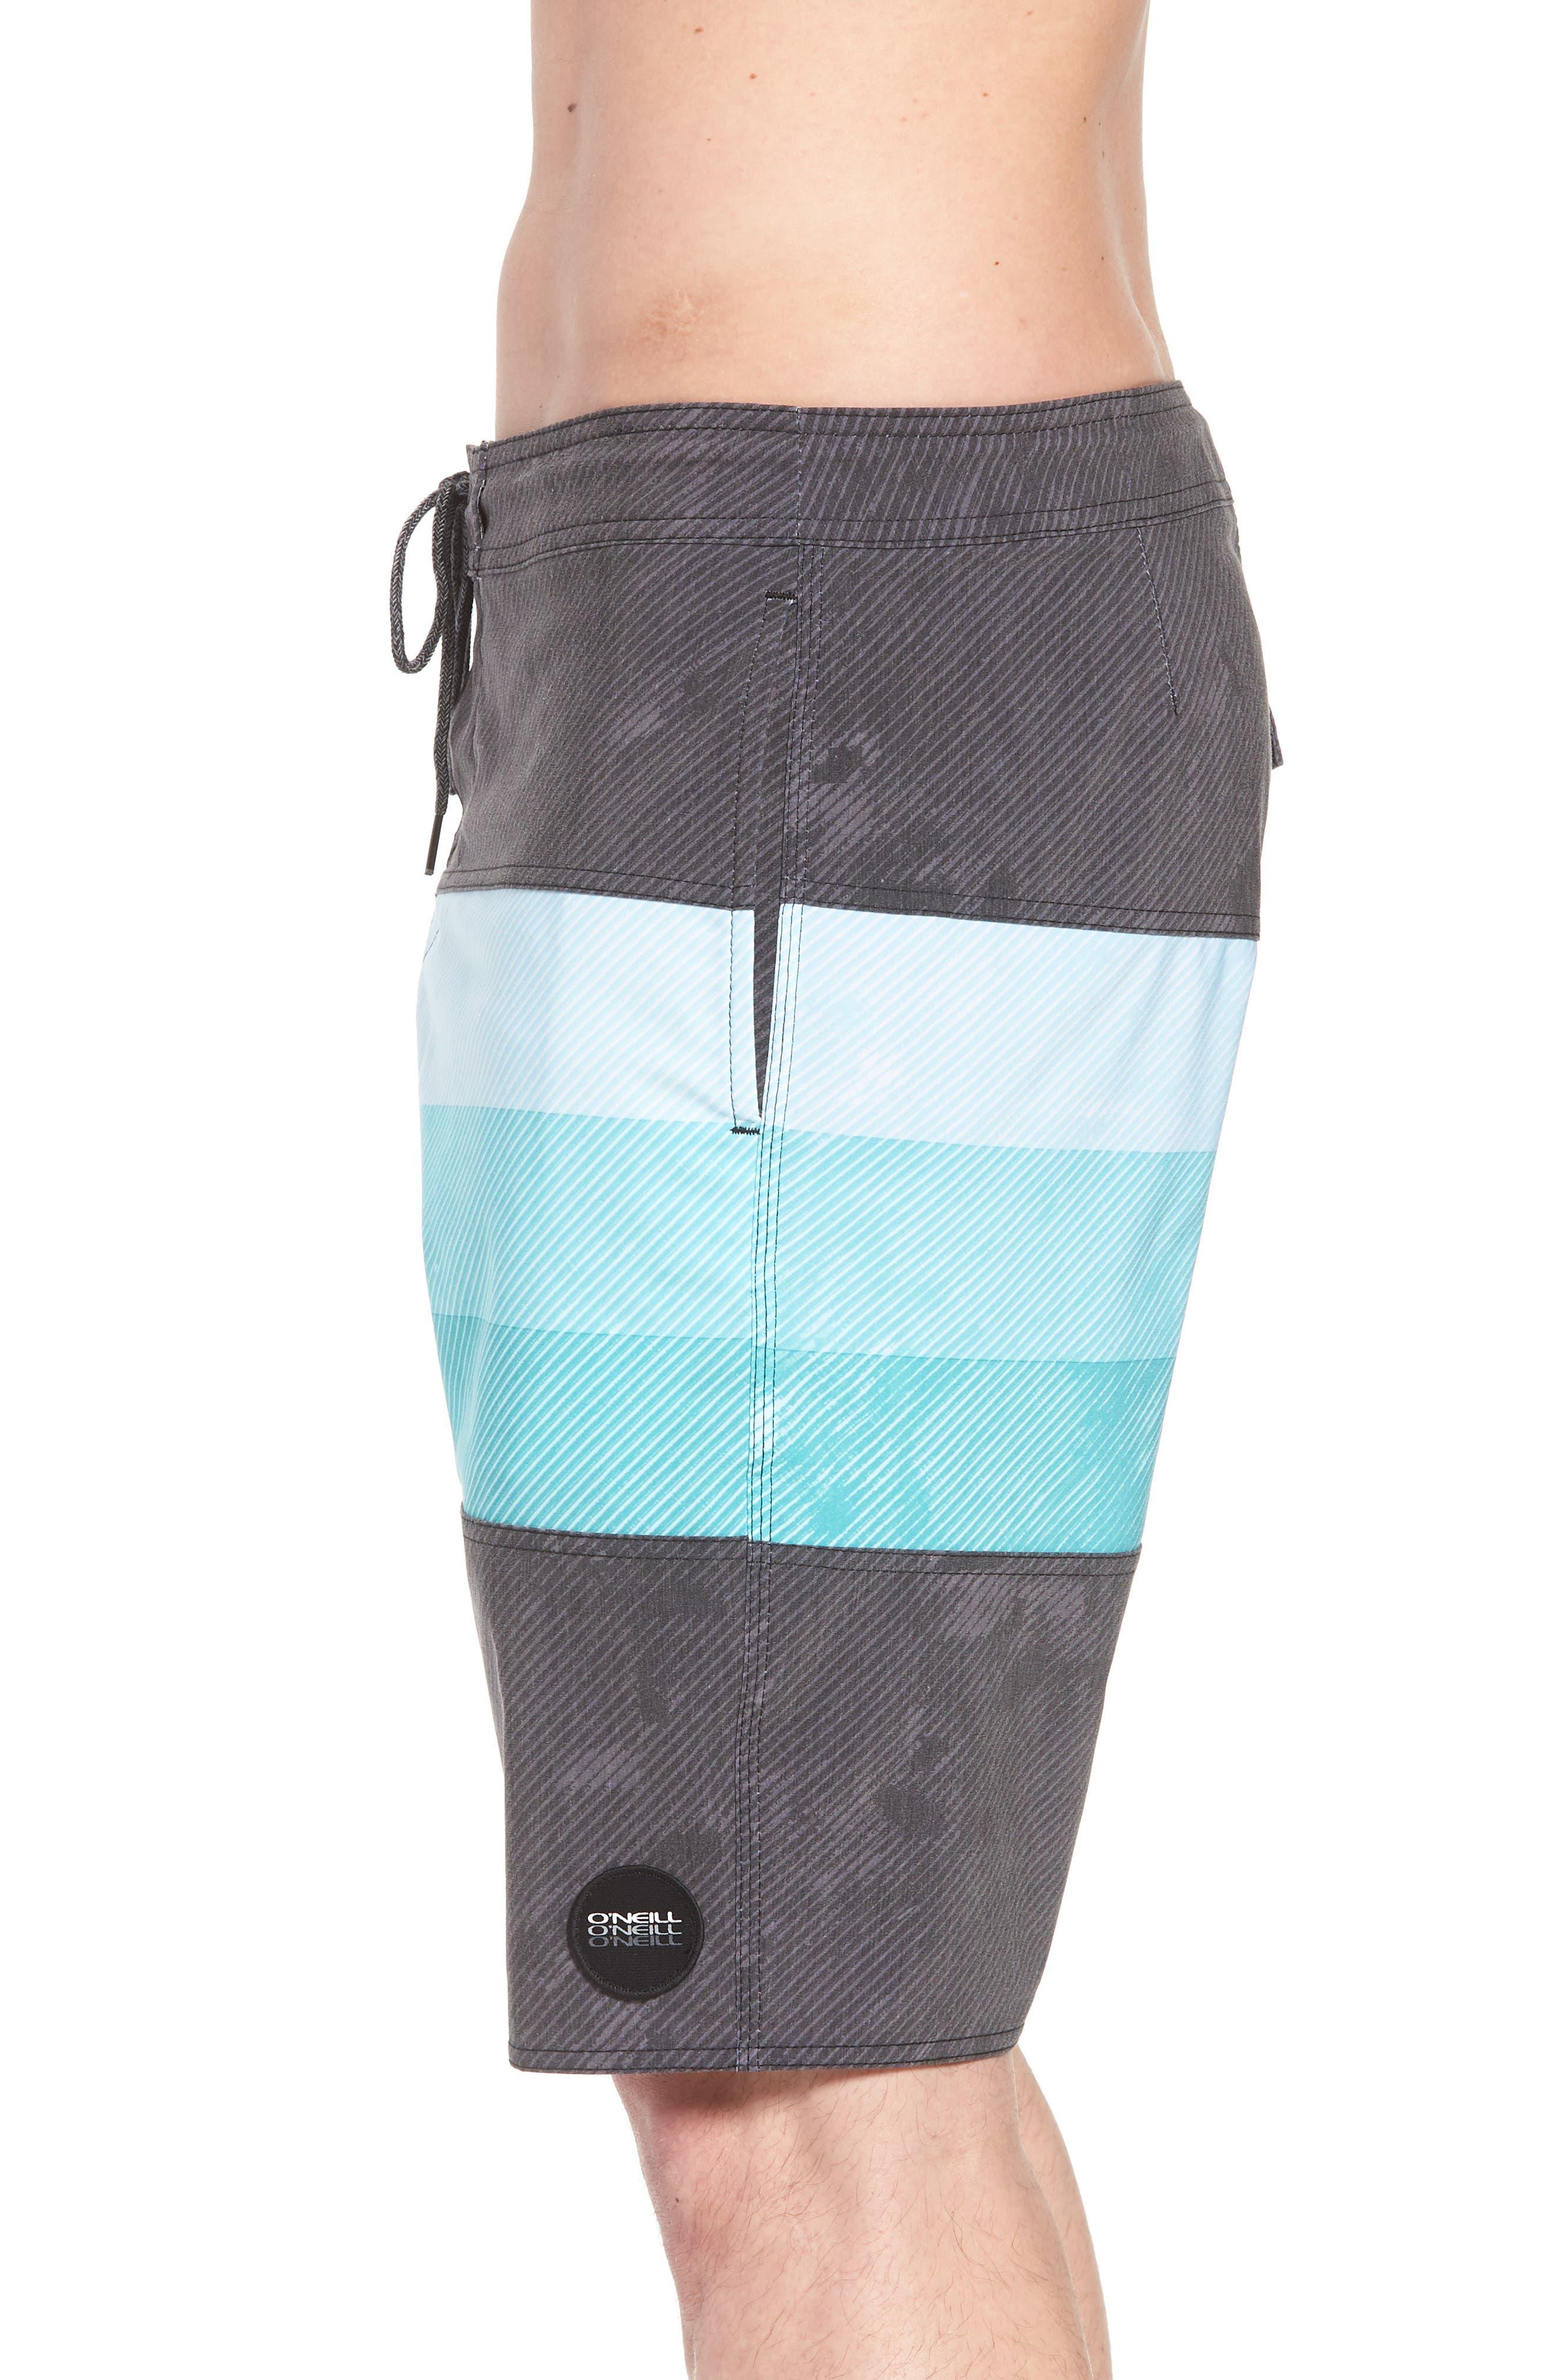 Region Cruzer Board Shorts,                             Alternate thumbnail 3, color,                             Black